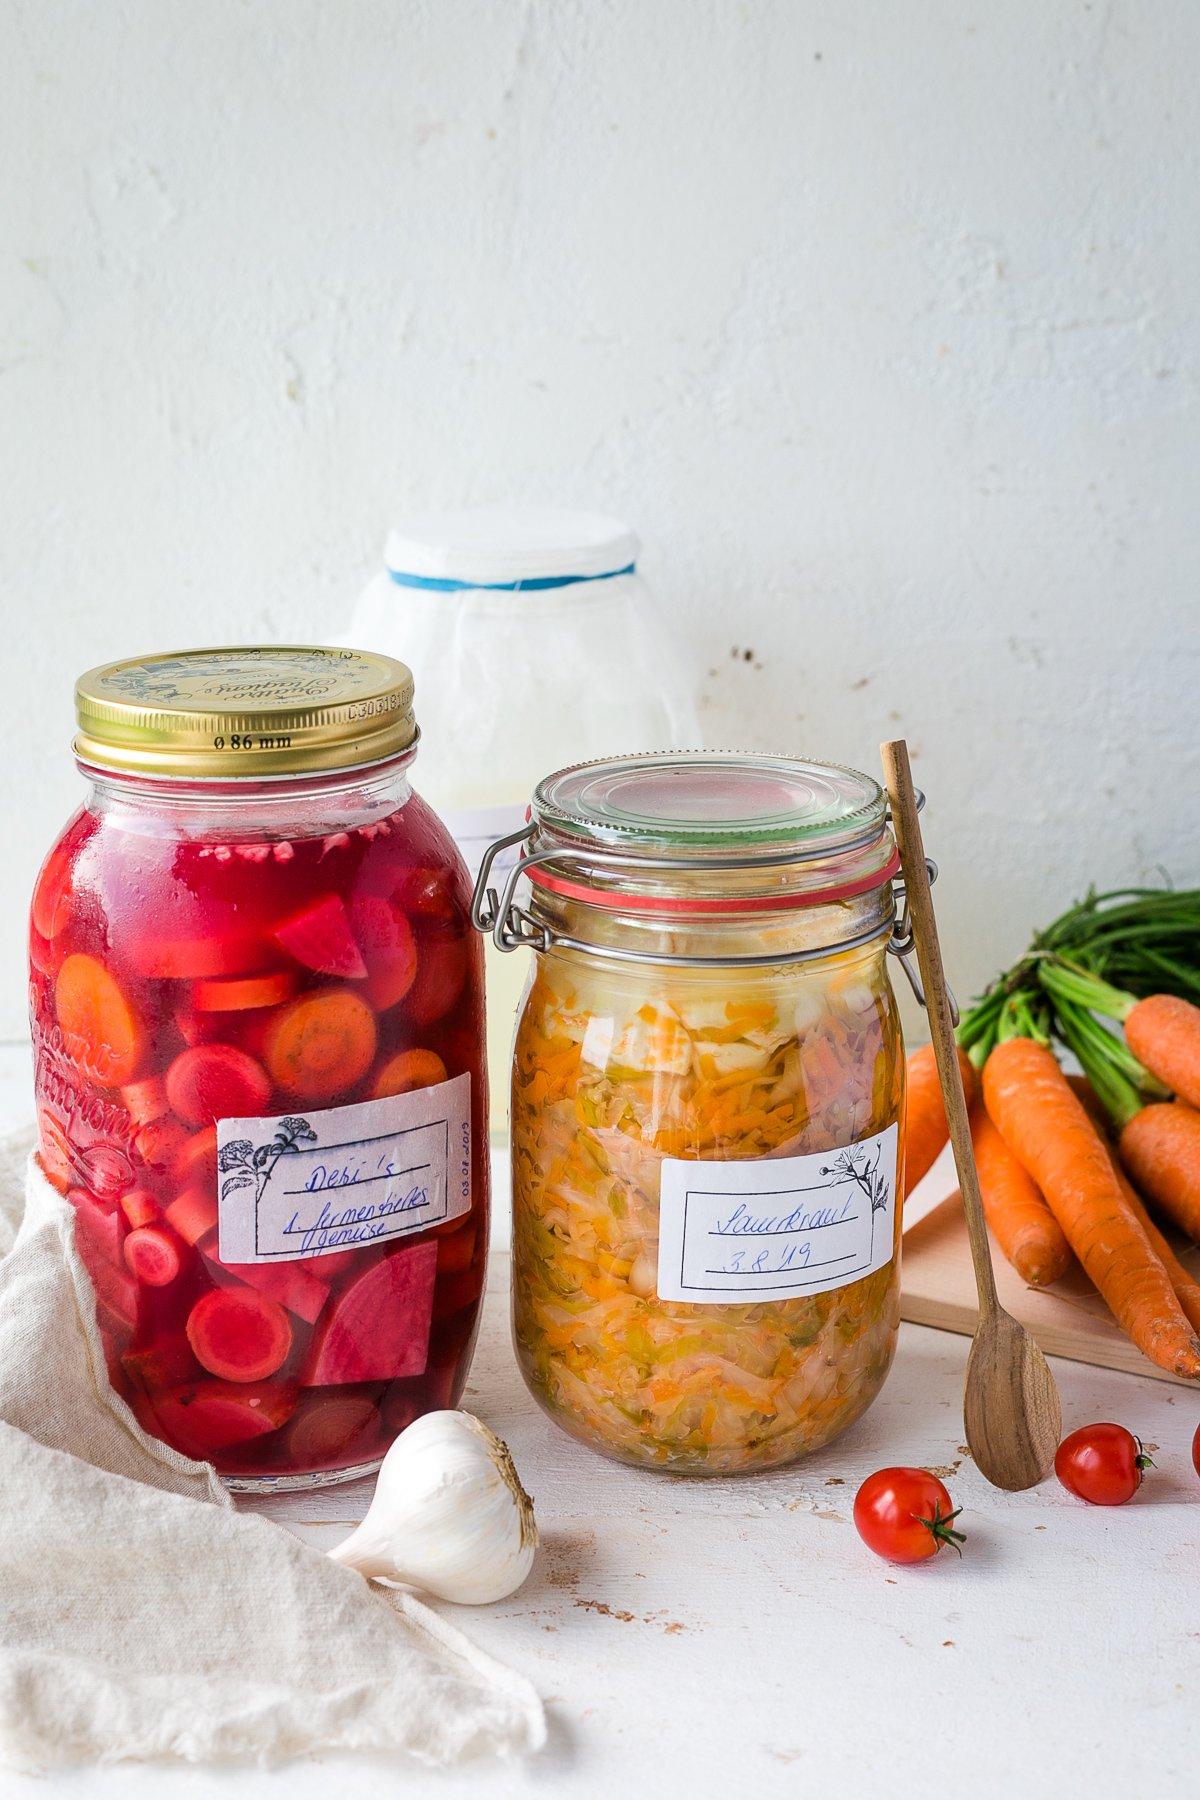 Gemuese fermentieren